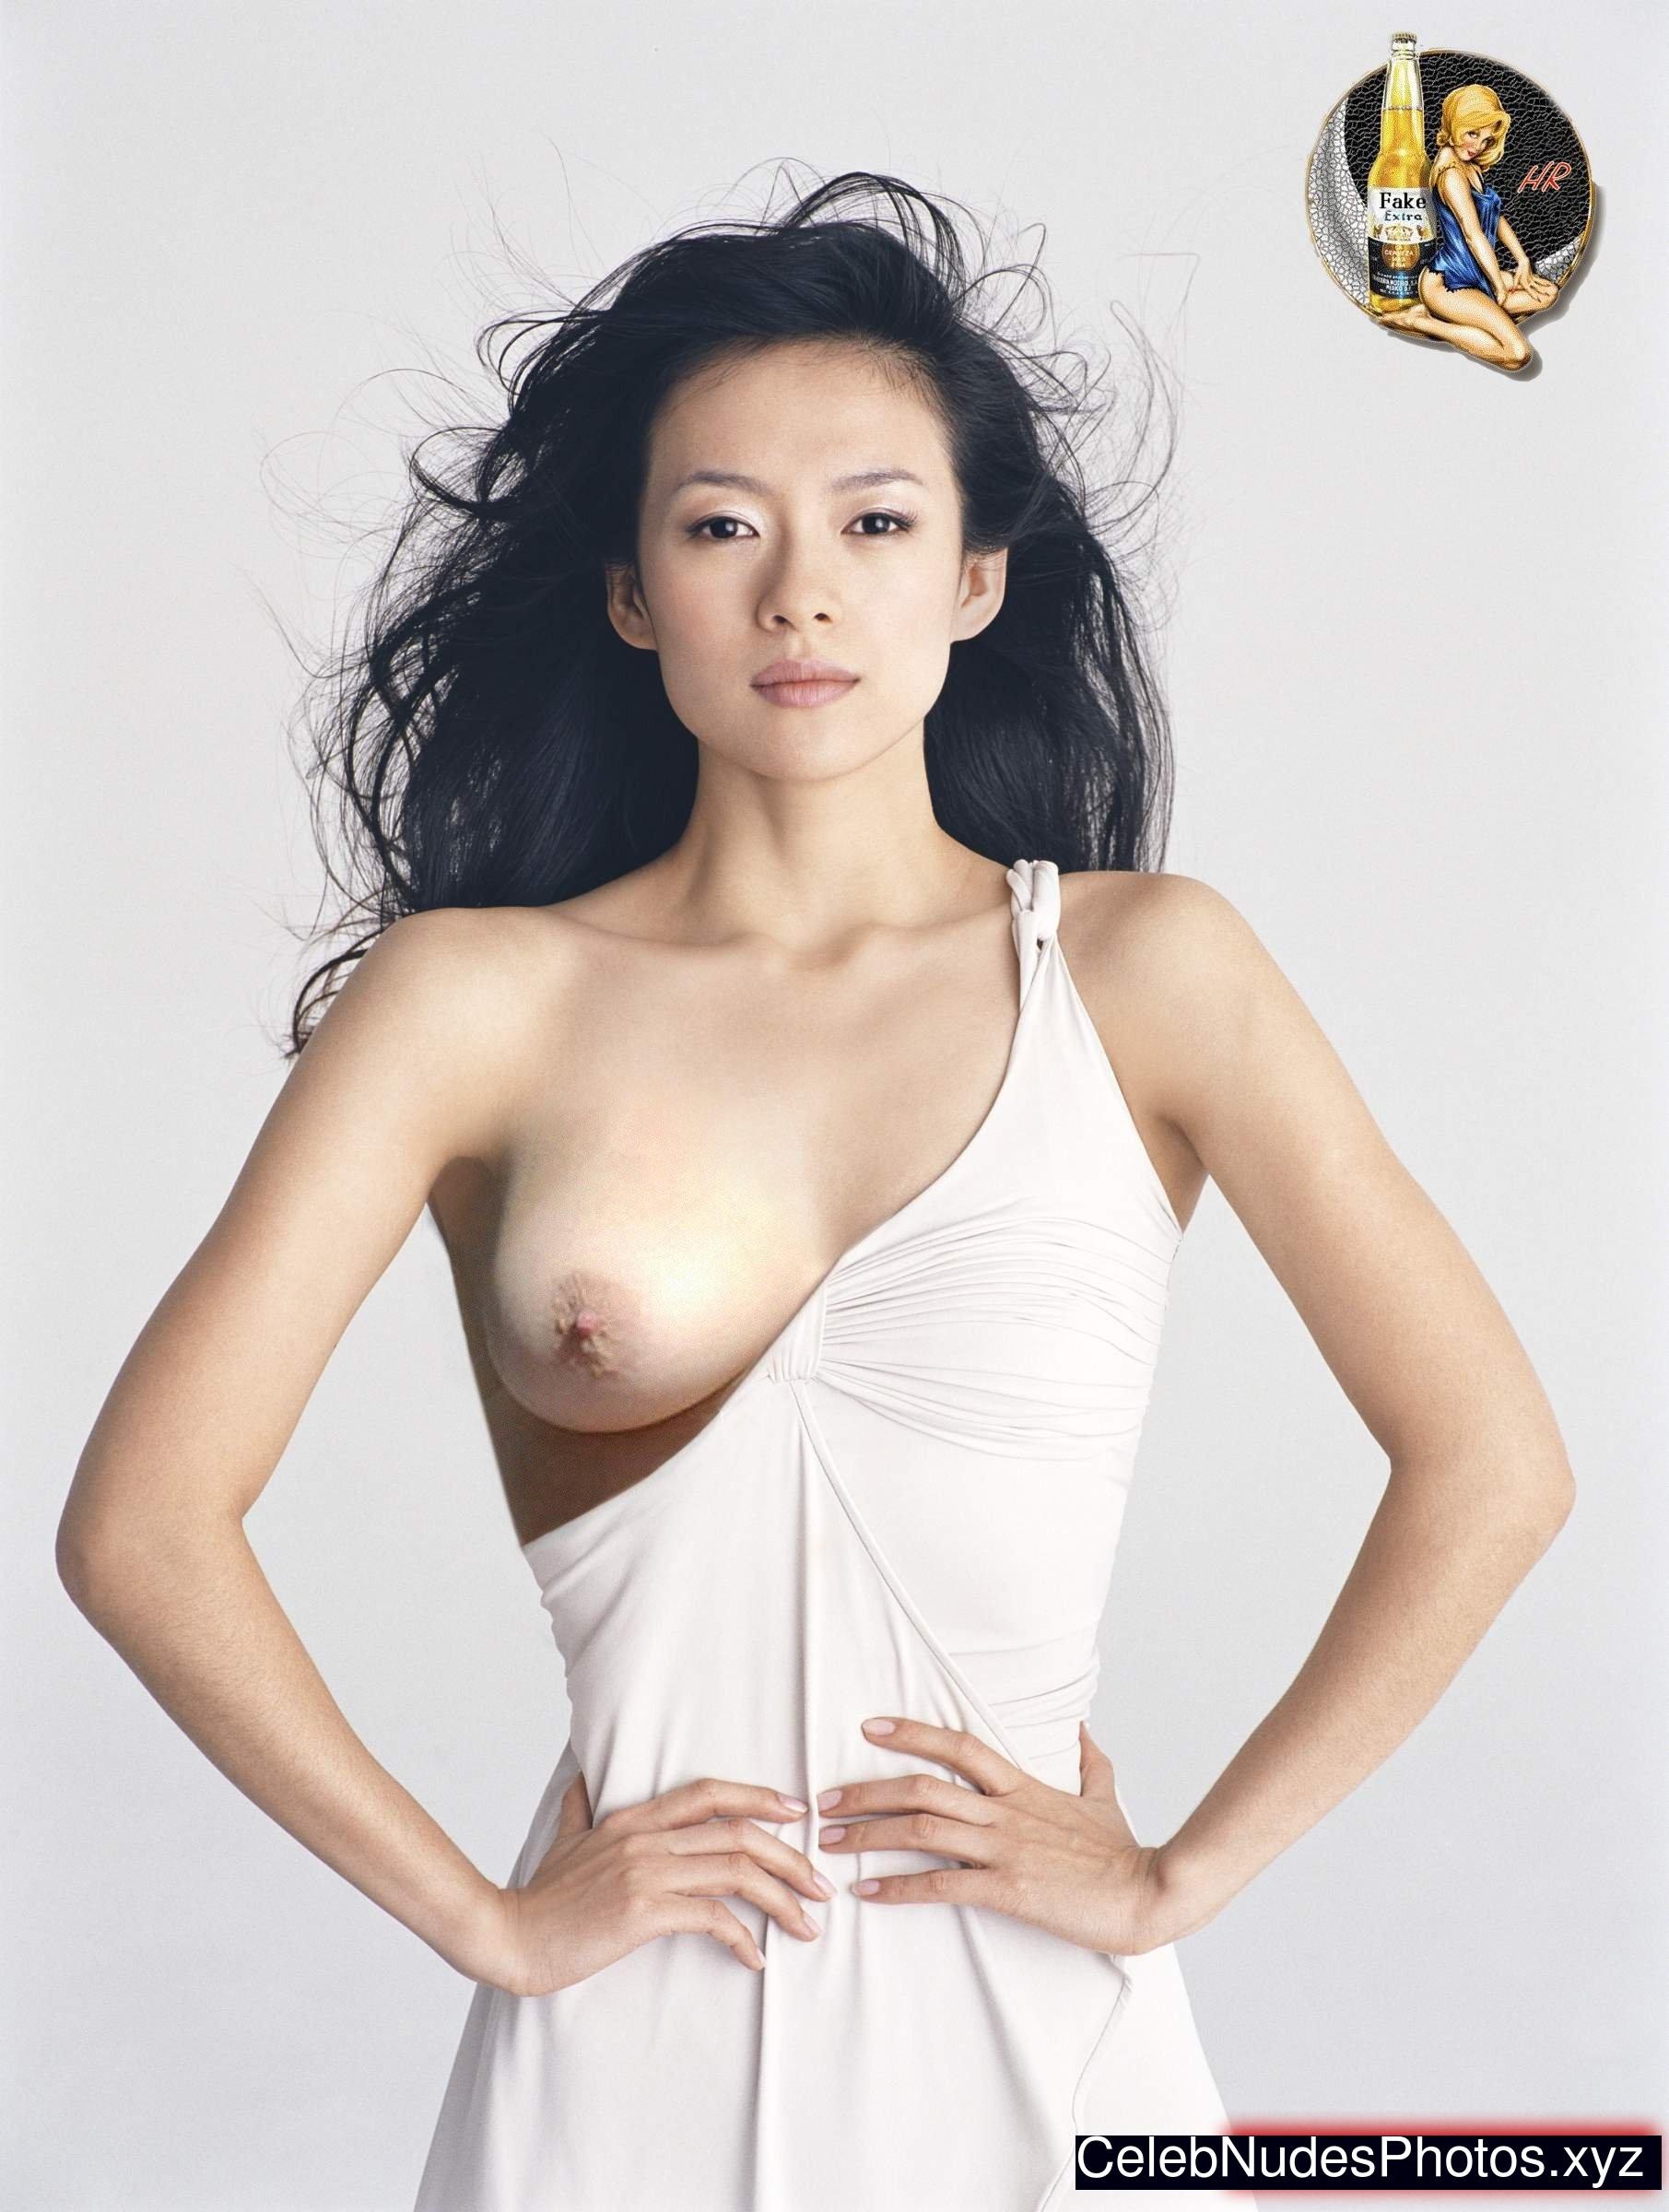 Homemade amateur mature wife nude